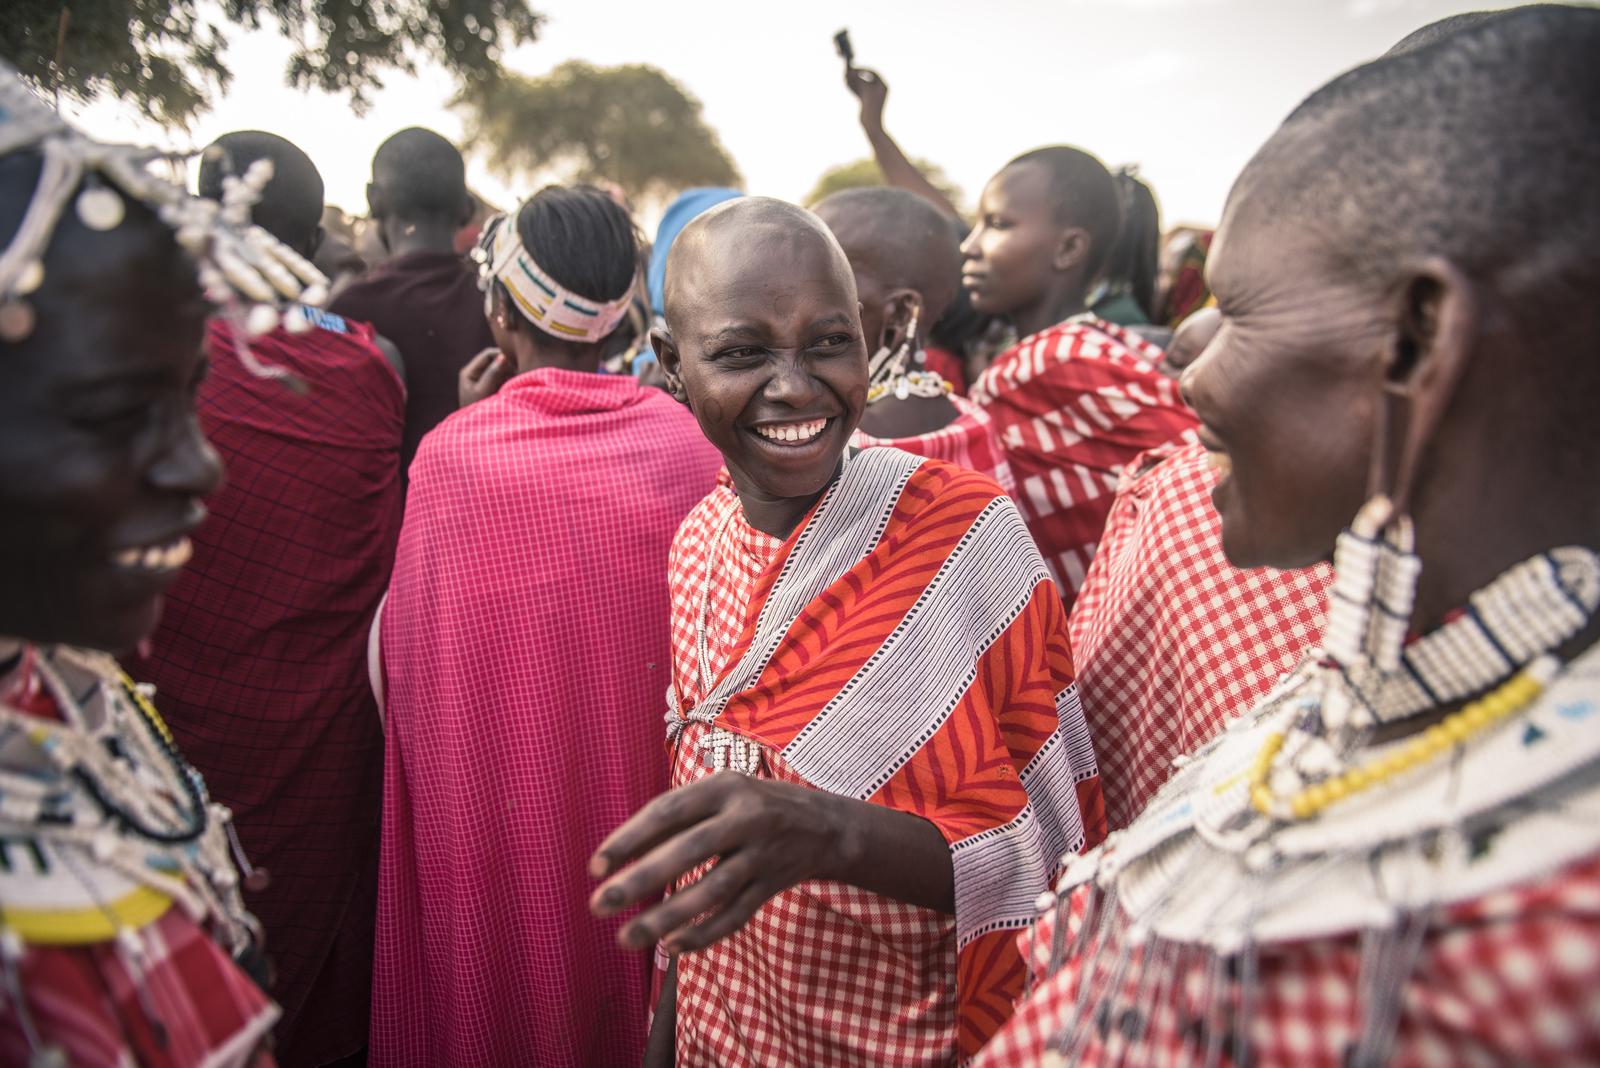 Maasai women watching Maasai men performing traditional dance in 2015.Photo credit: © Nick Hall